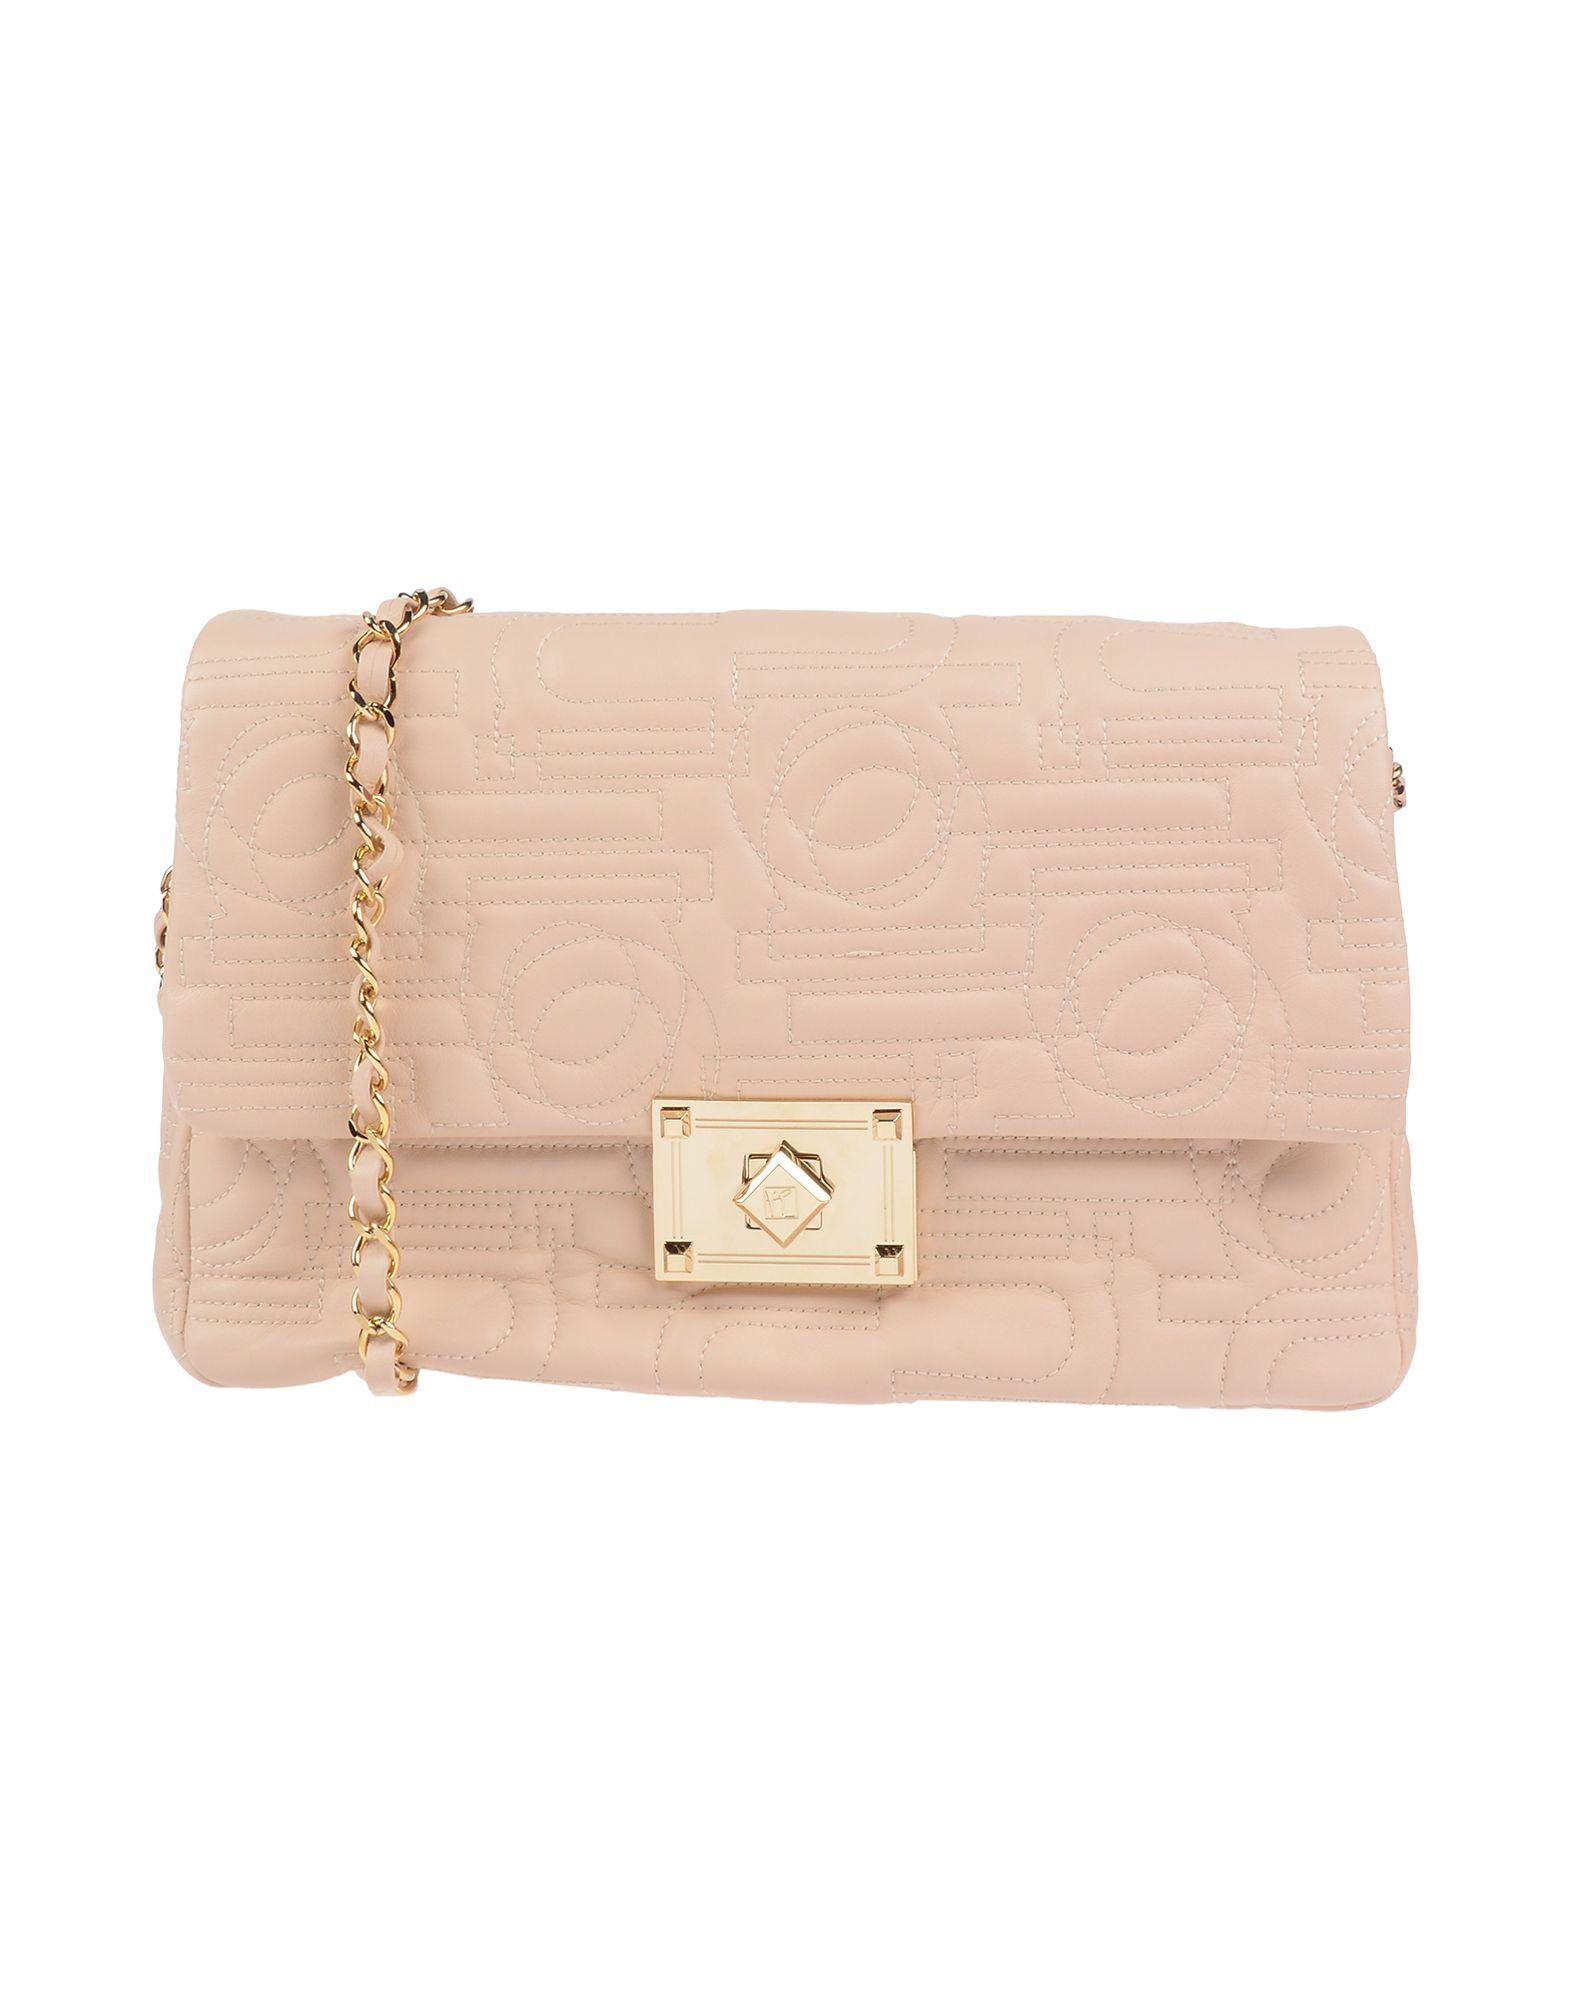 7930b2315b Ballin Shoulder Bag - Women Ballin Shoulder Bags online on YOOX ...